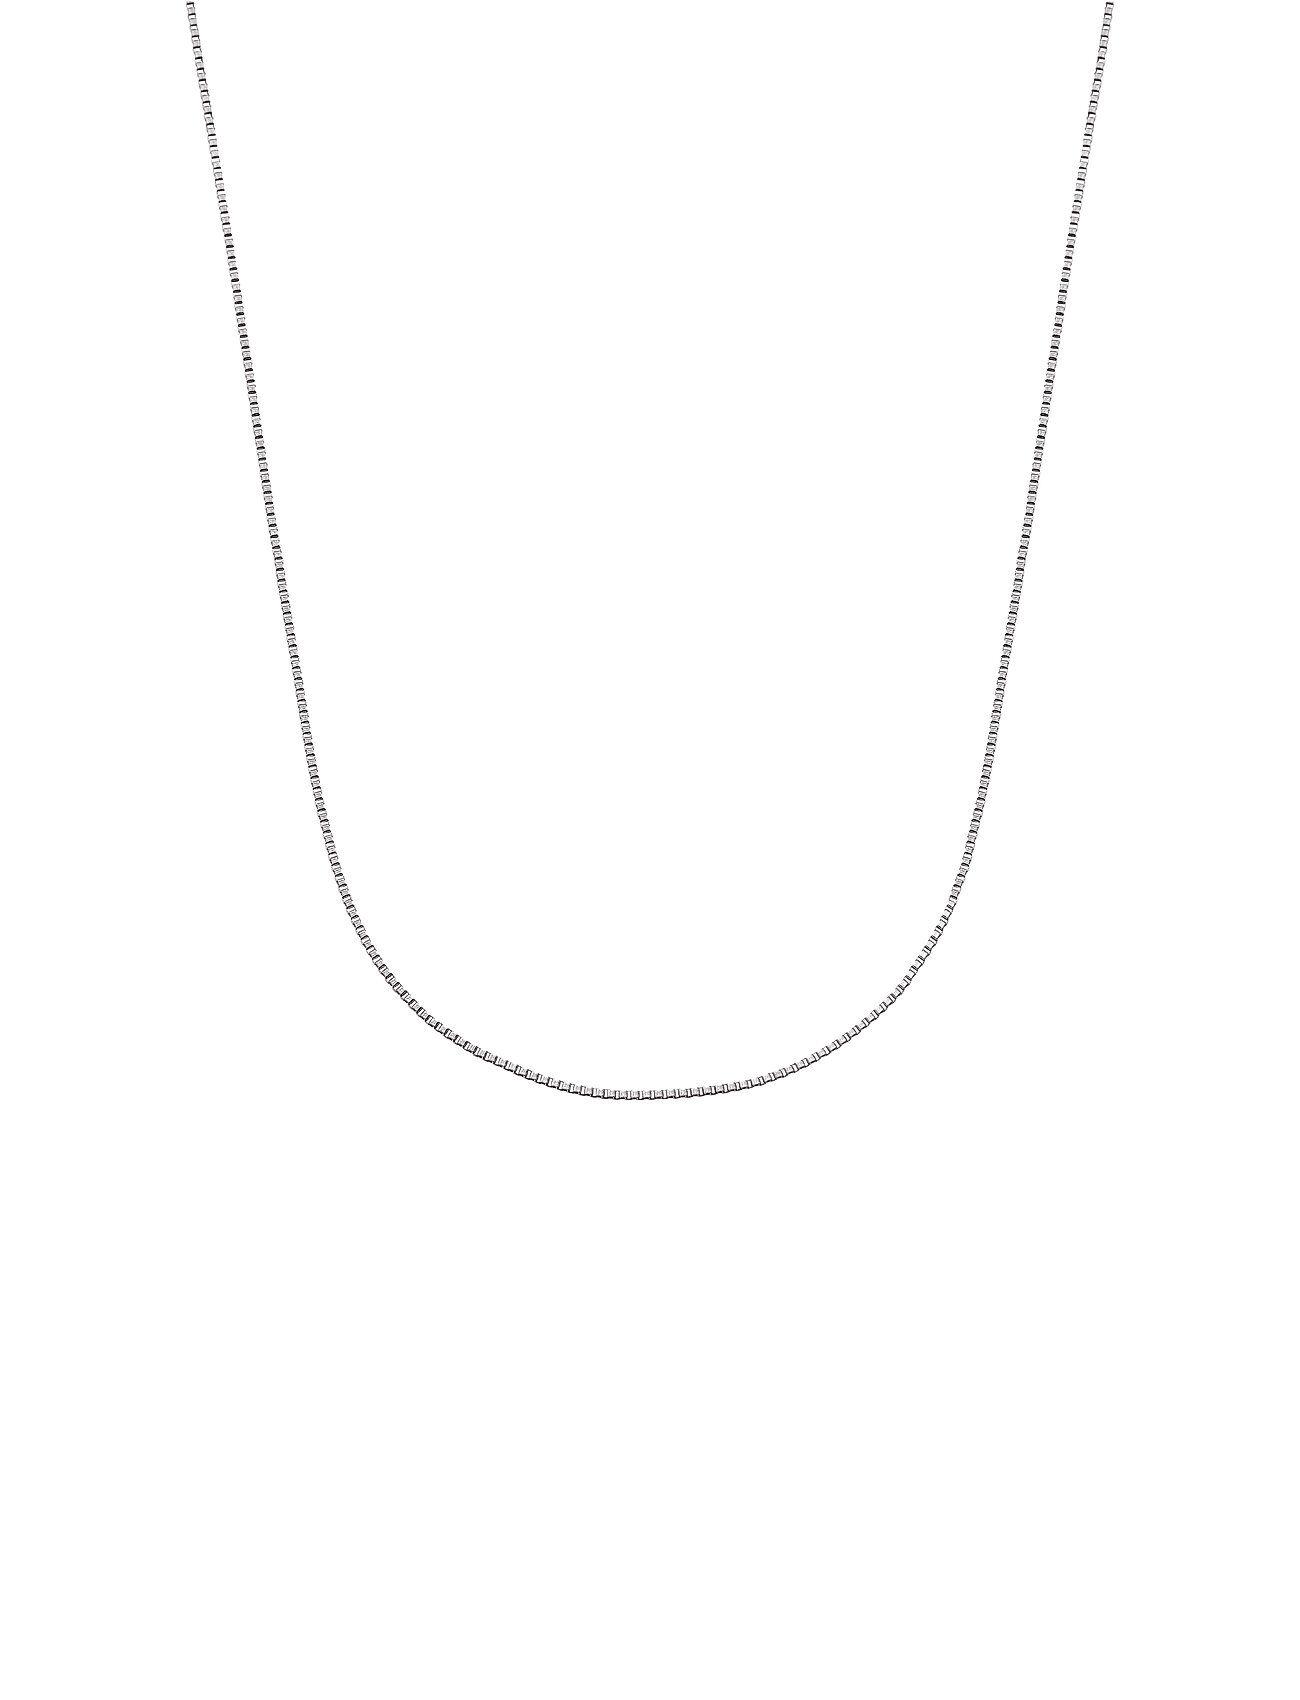 Edblad Charmentity Chain Box 50 Cm Steel Accessories Jewellery Necklaces Dainty Necklaces Hopea Edblad